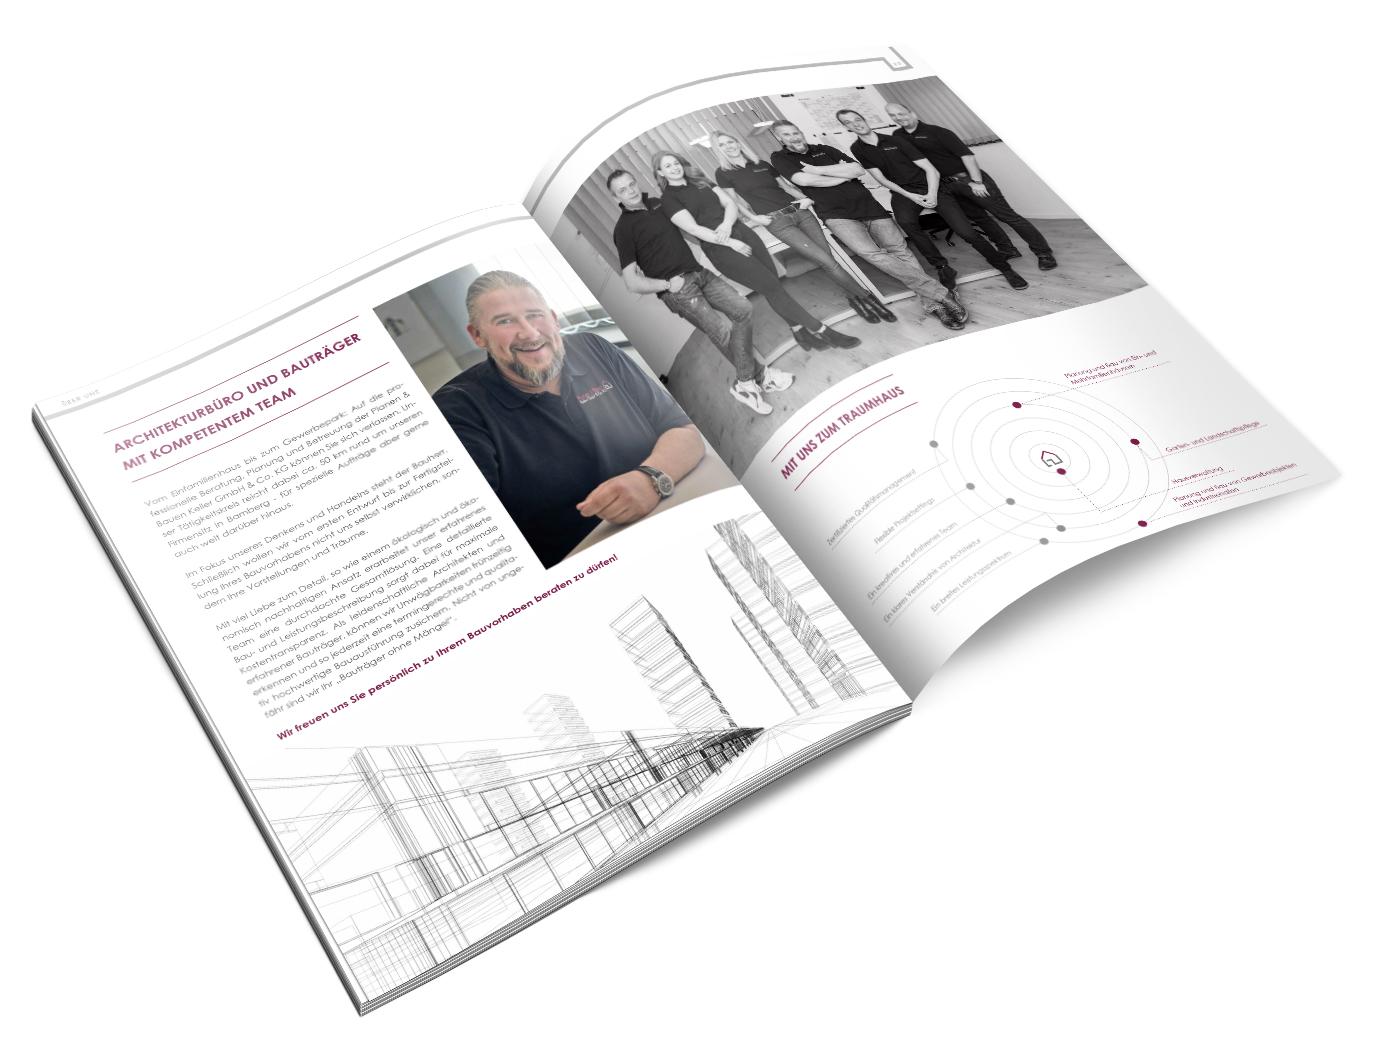 Planen & Bauen Keller GmbH & Co. KG - Imagebroschüre